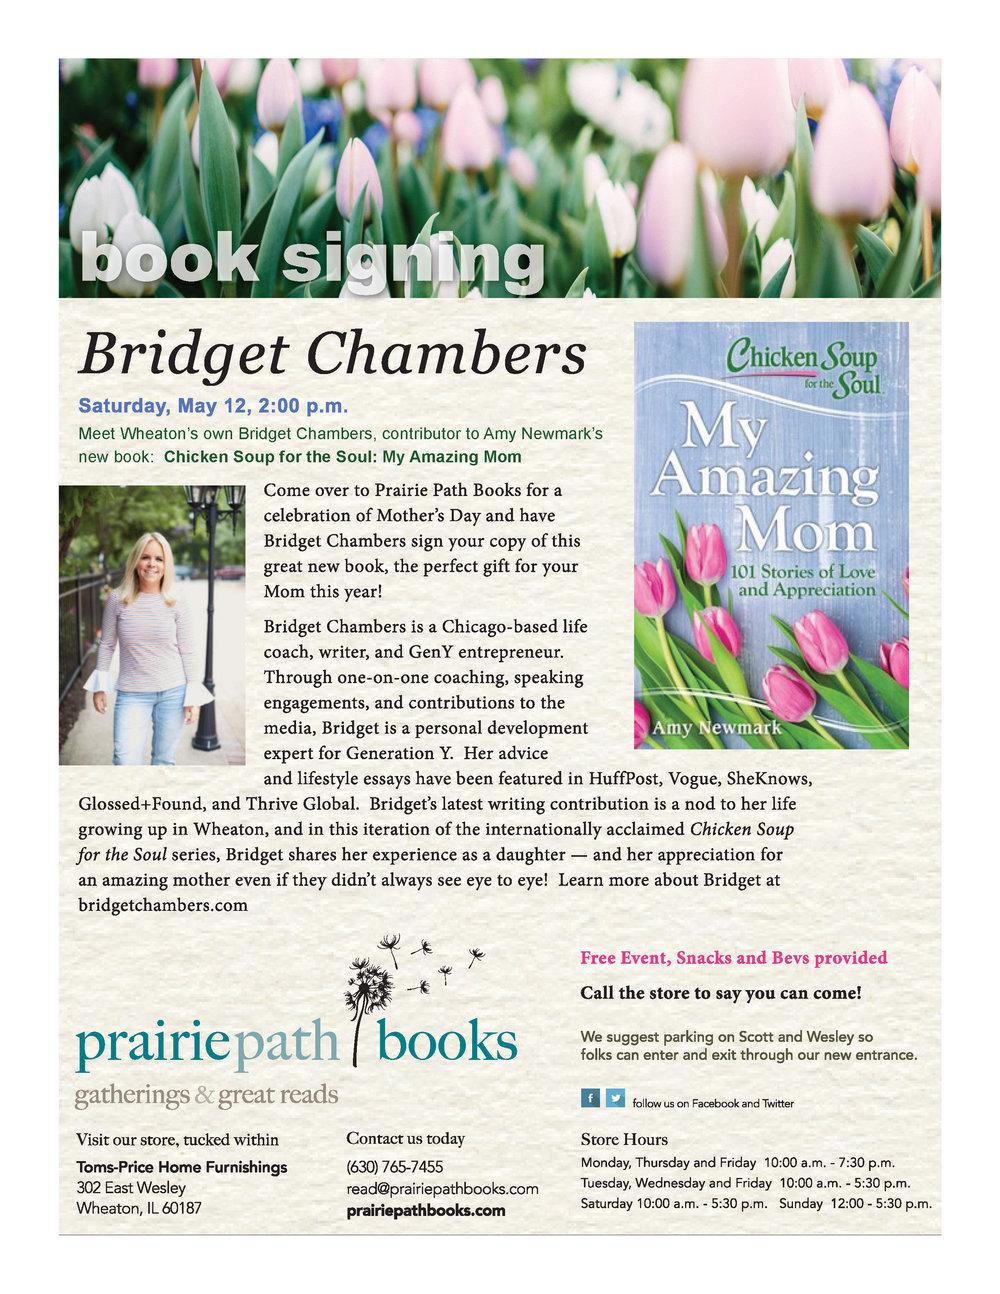 BridgetChambers_May12.jpg